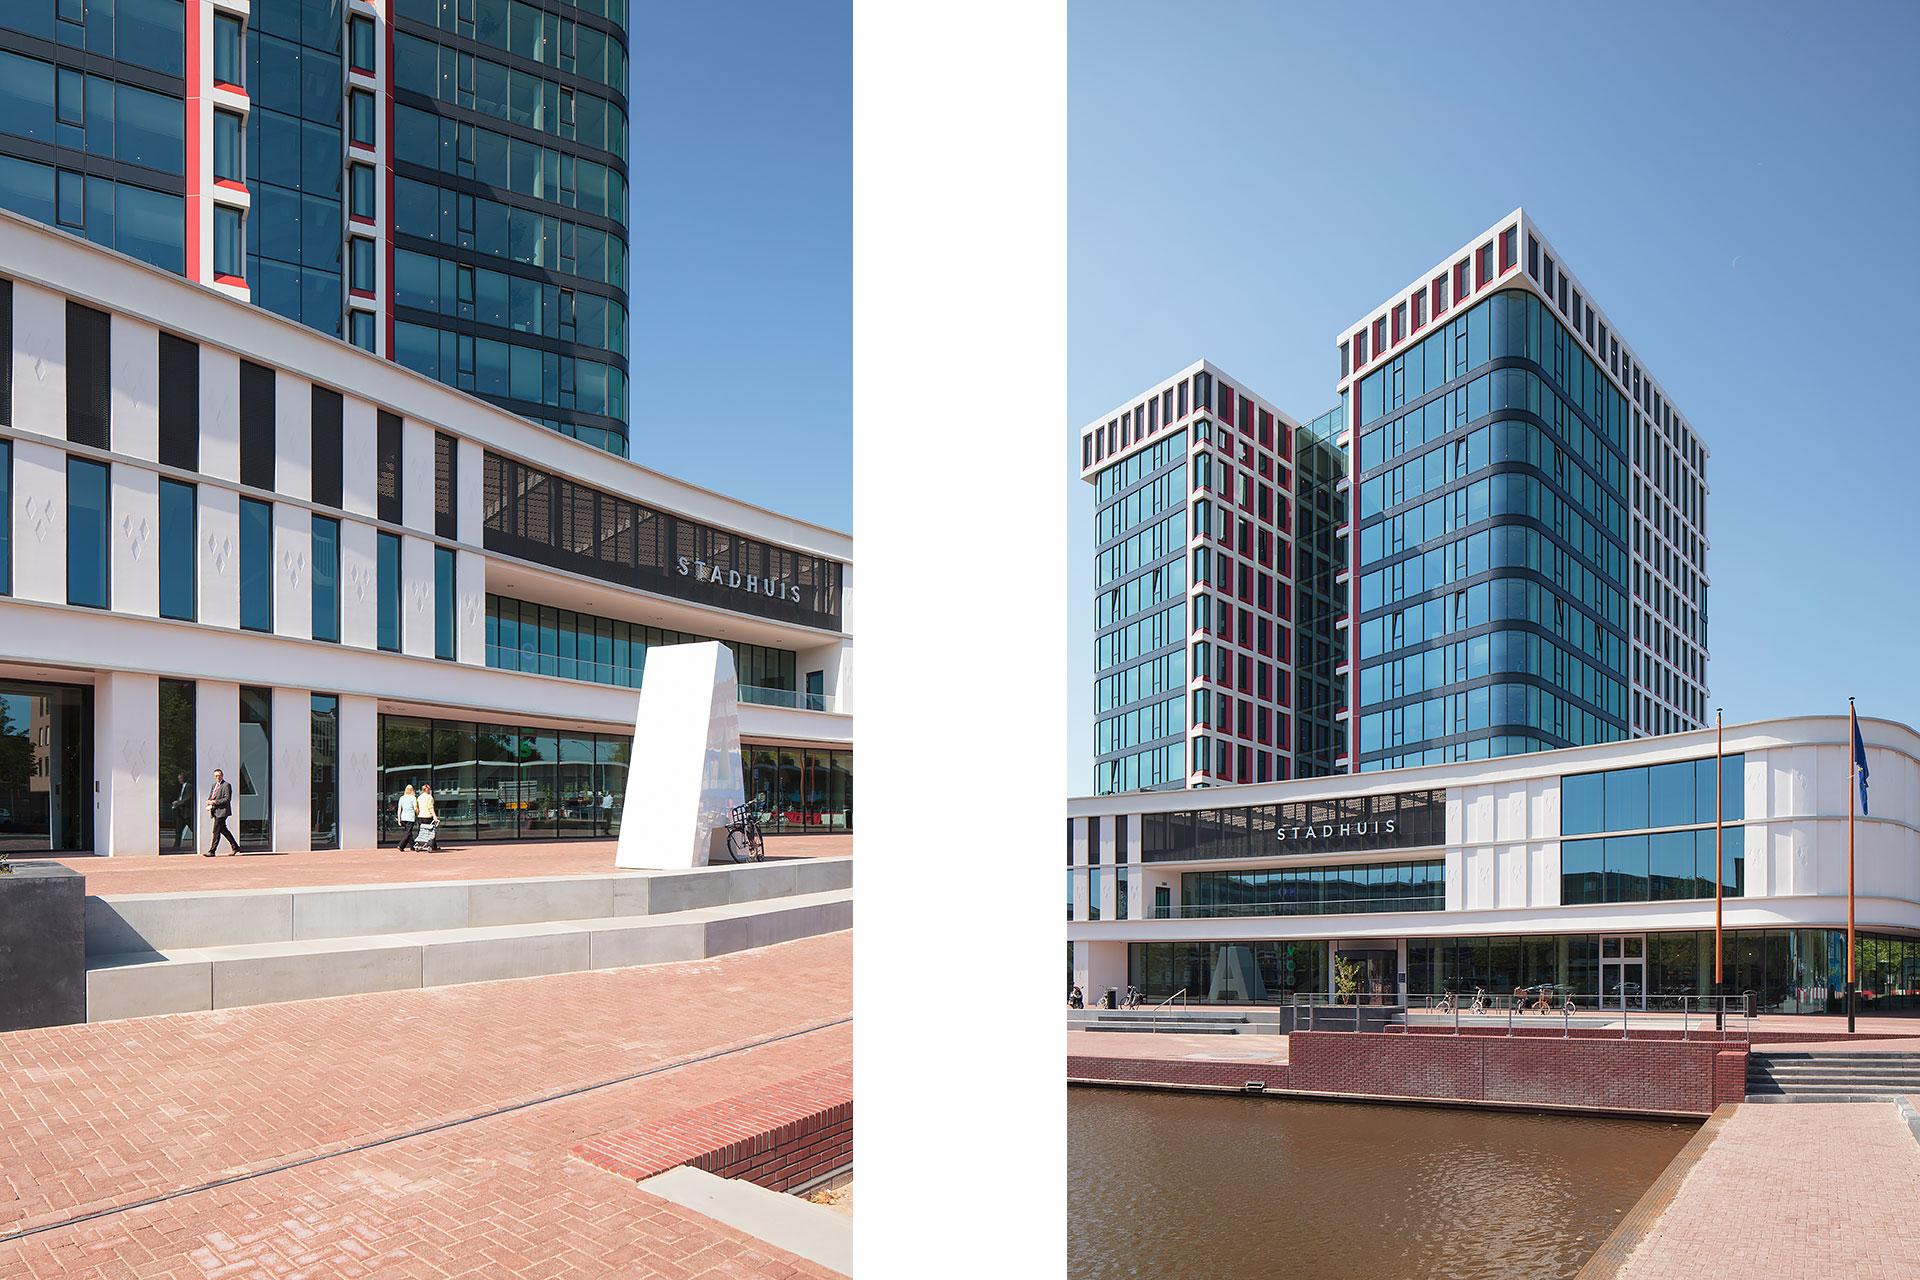 SP2015-Stadhuis-Almelo-architectuurfoto-03